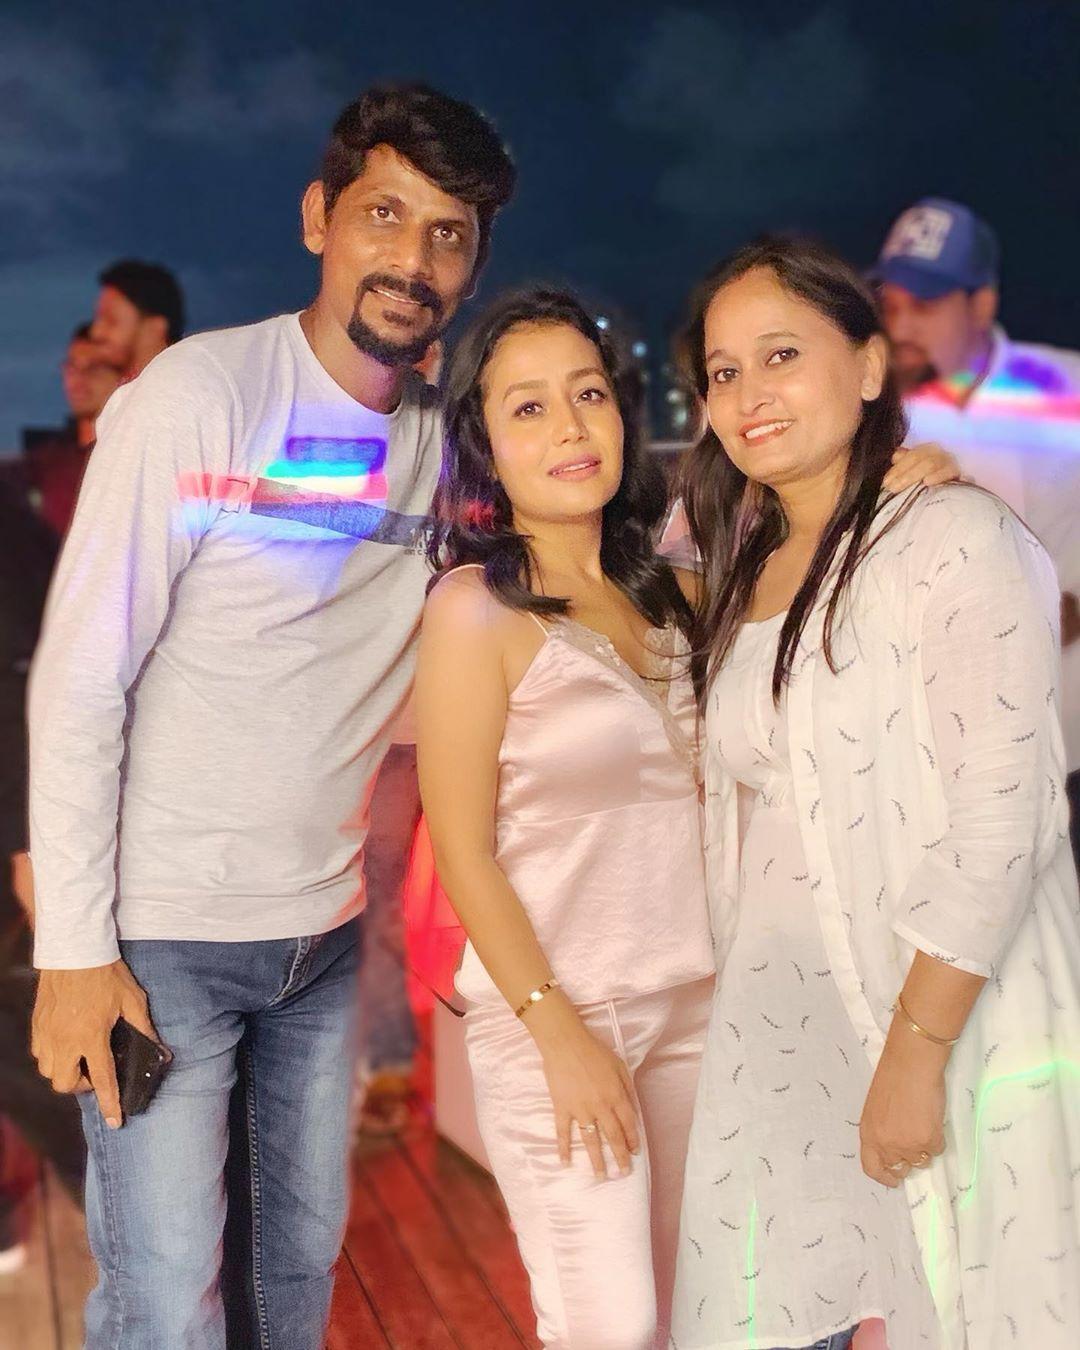 Bollywood Tadka, नेहा कक्कड़ इमेज, नेहा कक्कड़ फोटो, नेहा कक्कड़ पिक्चर